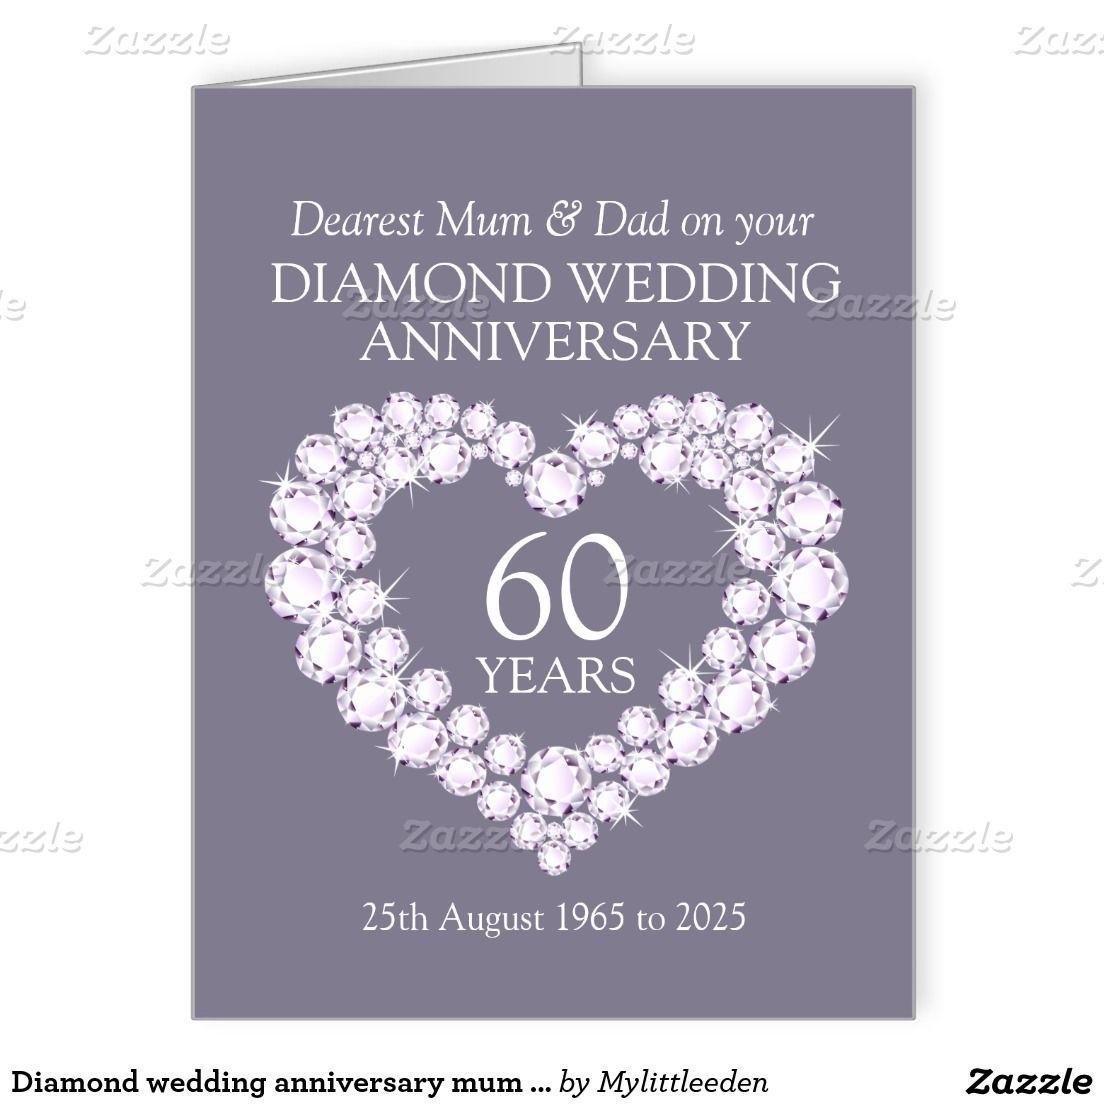 Diamond Wedding Anniversary Mum And Dad Card Zazzle Com Dad Cards Anniversary Cards Wedding Anniversary